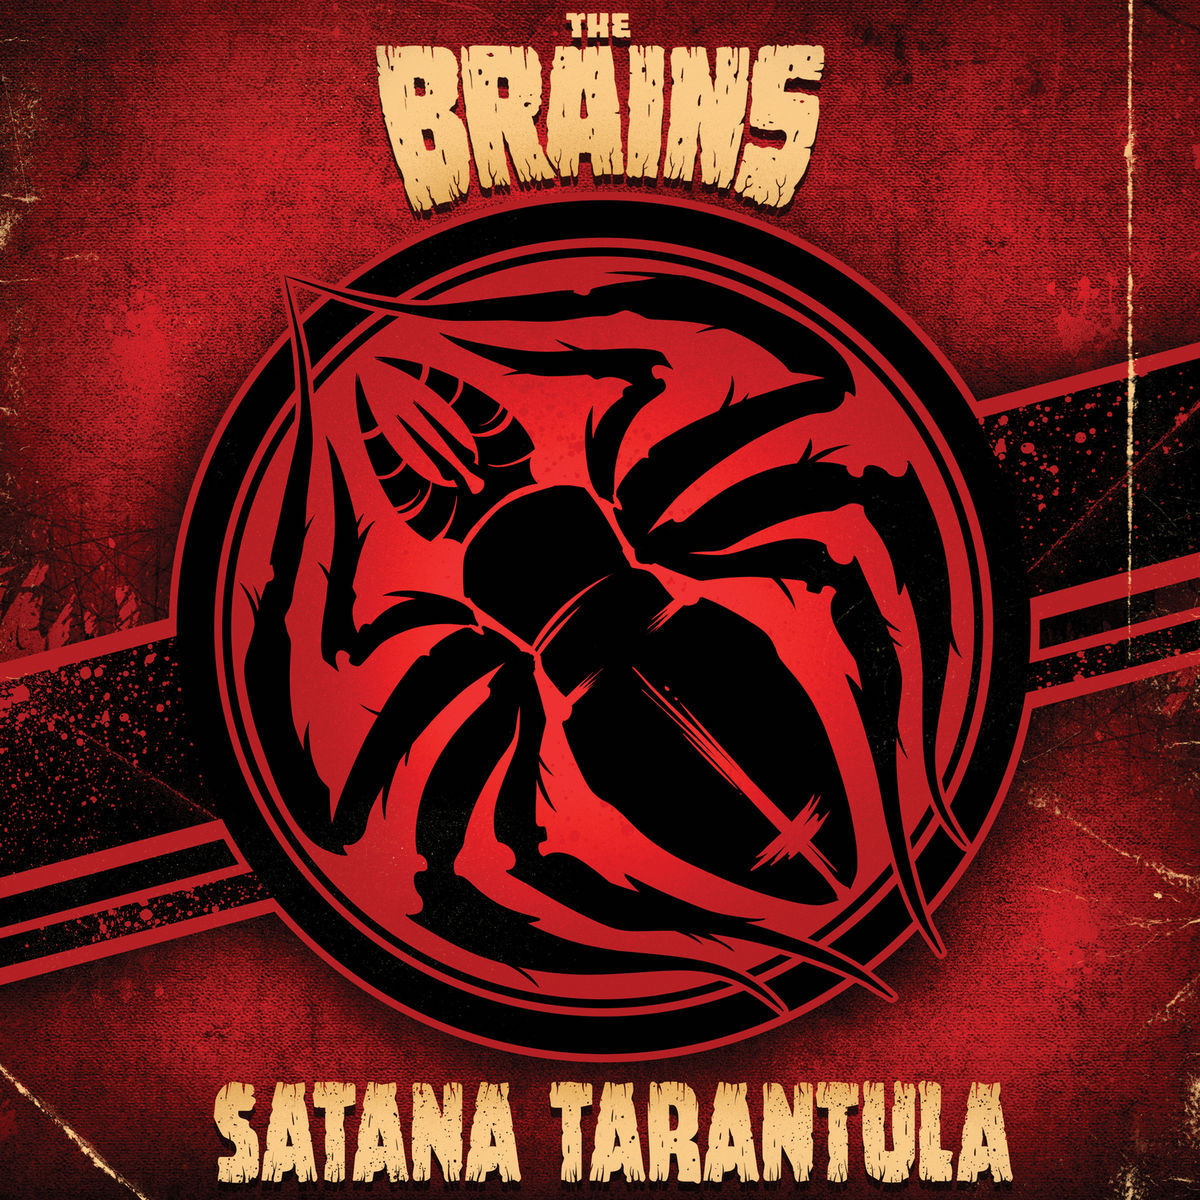 The Brains - Satana Tarantula (2020)